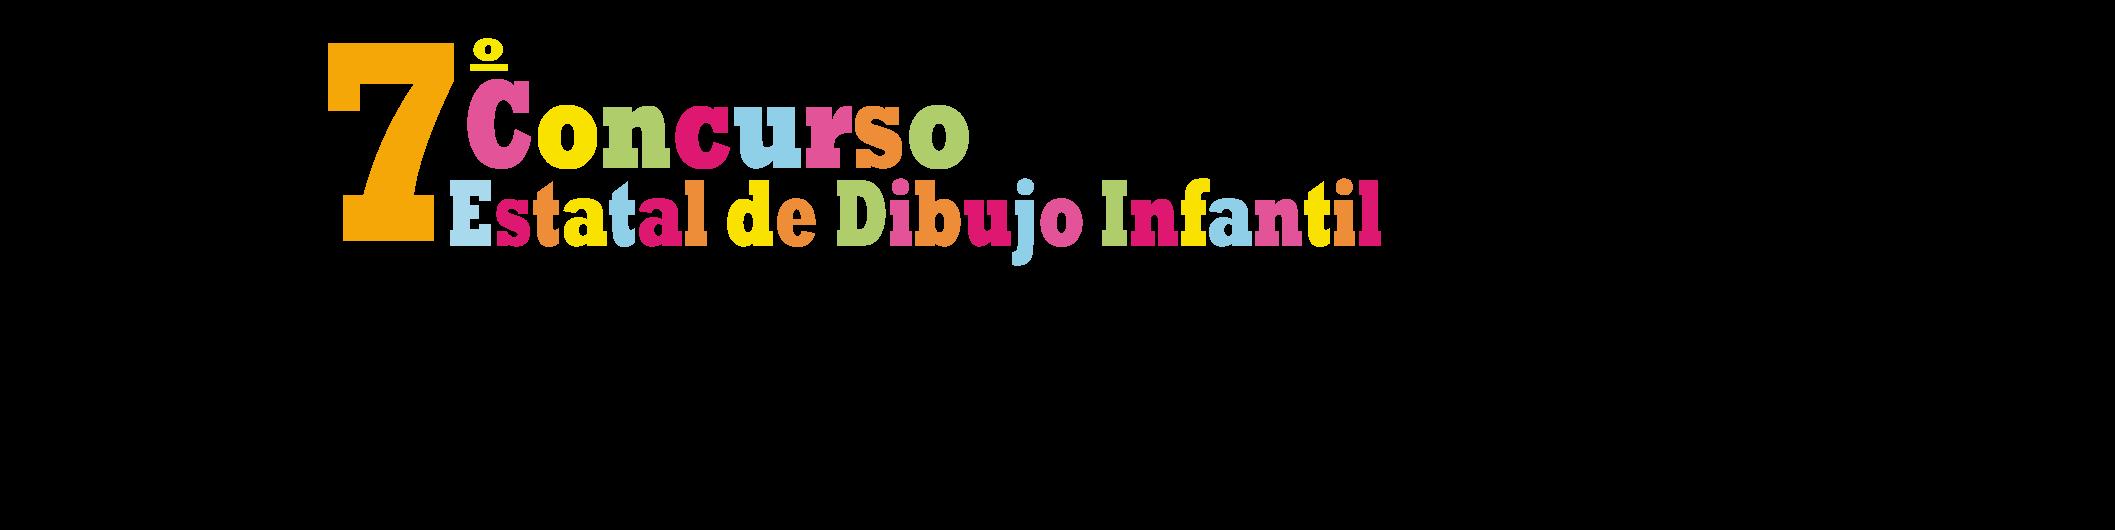 dibujoinfantil_2020_inscribete_titulo.png